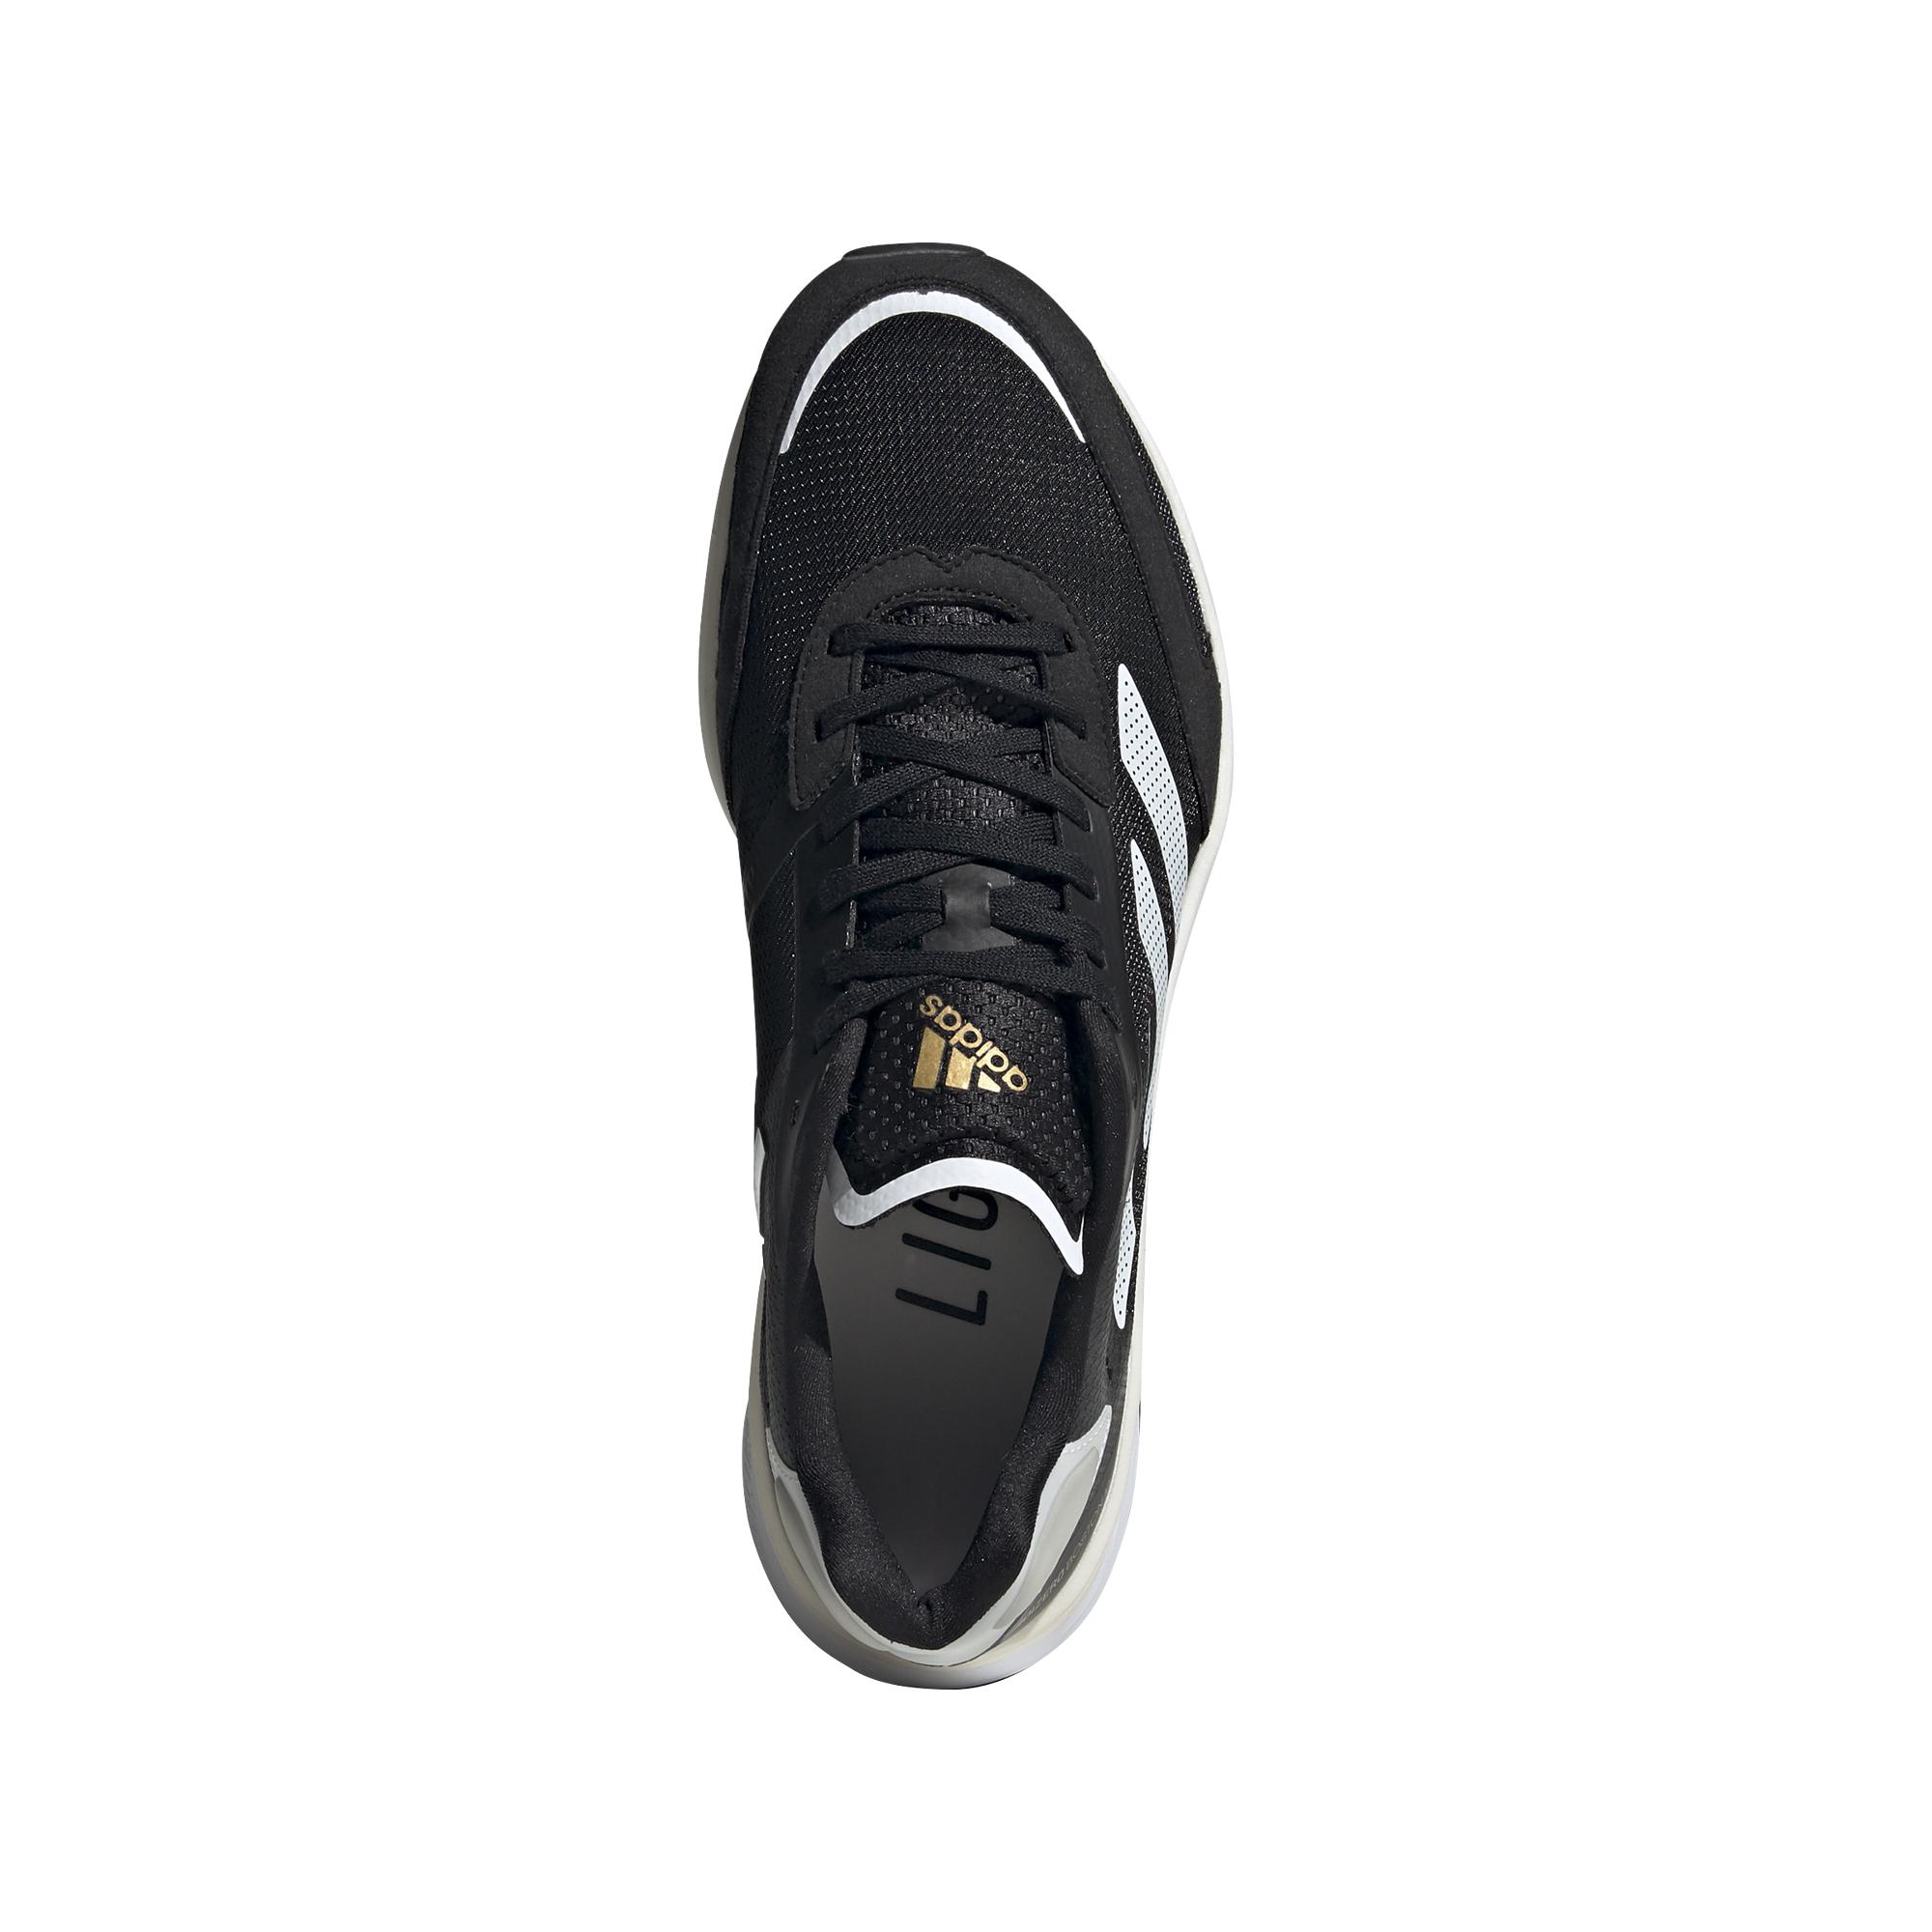 Men's Adidas Adizero Boston 10 Running Shoe - Color: Core Black / Cloud White / Gold Metallic - Size: 6.5 - Width: Regular, Core Black / Cloud White / Gold Metallic, large, image 3